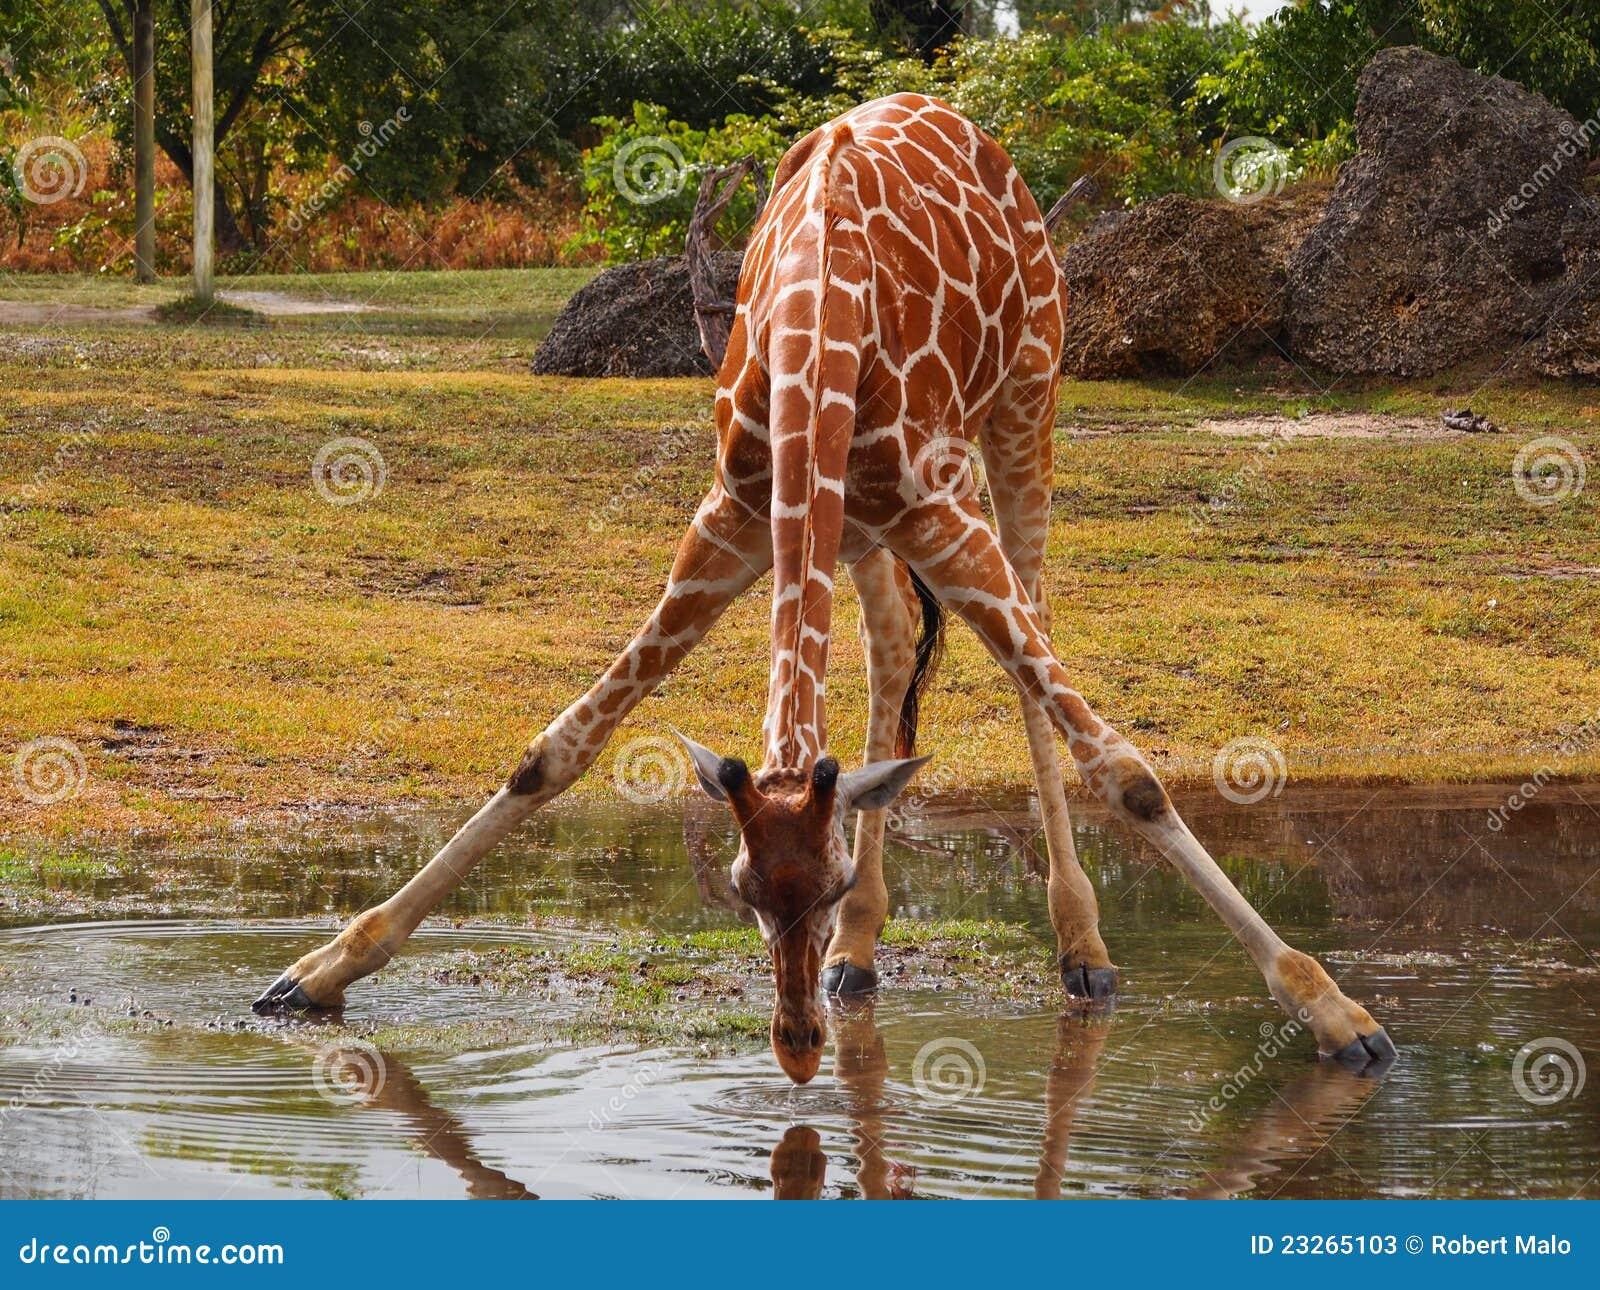 Drinking Giraffe Stock Photos - Image: 23265103